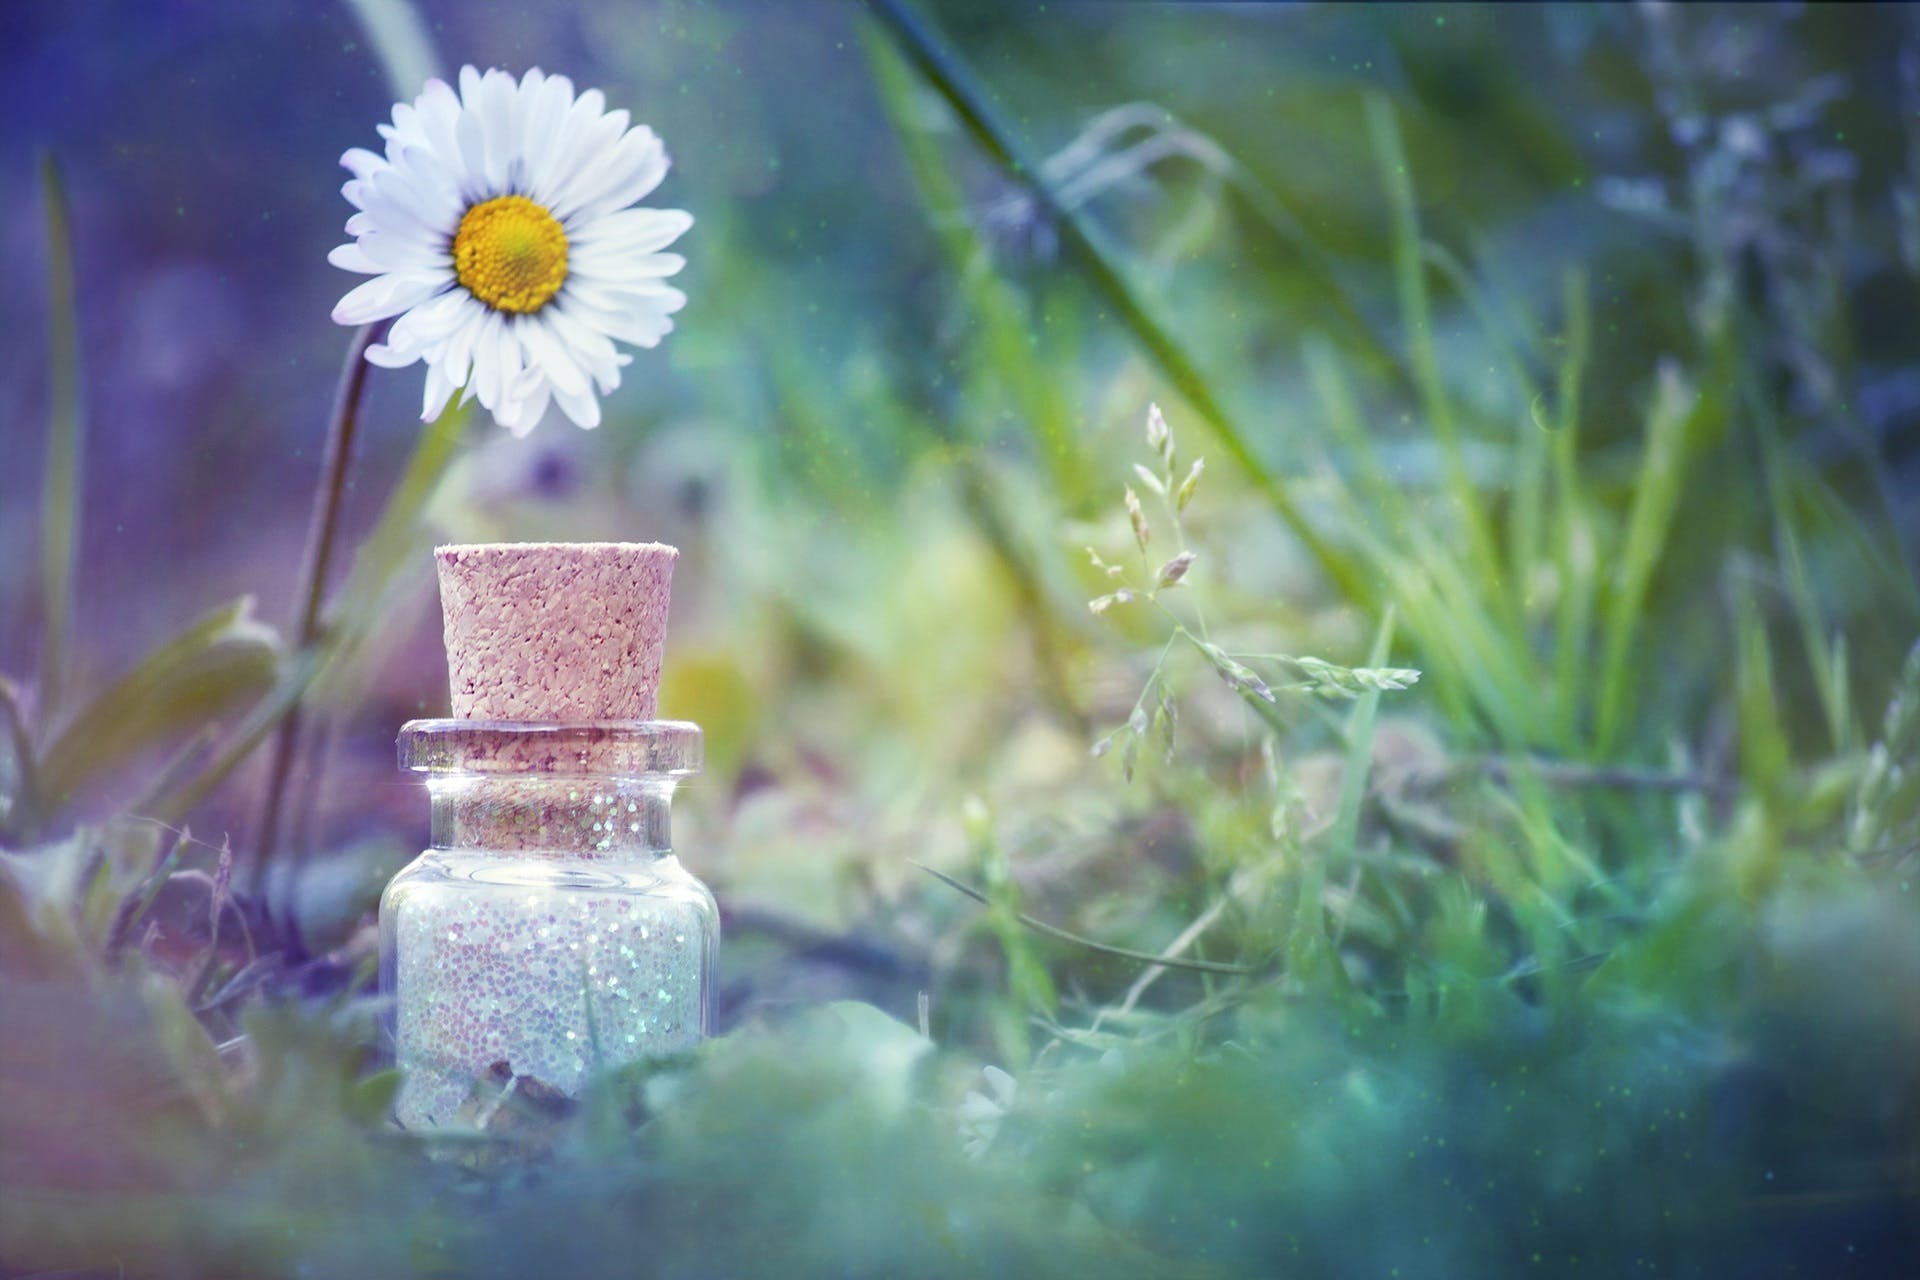 Daisy Flower Beside Bottle